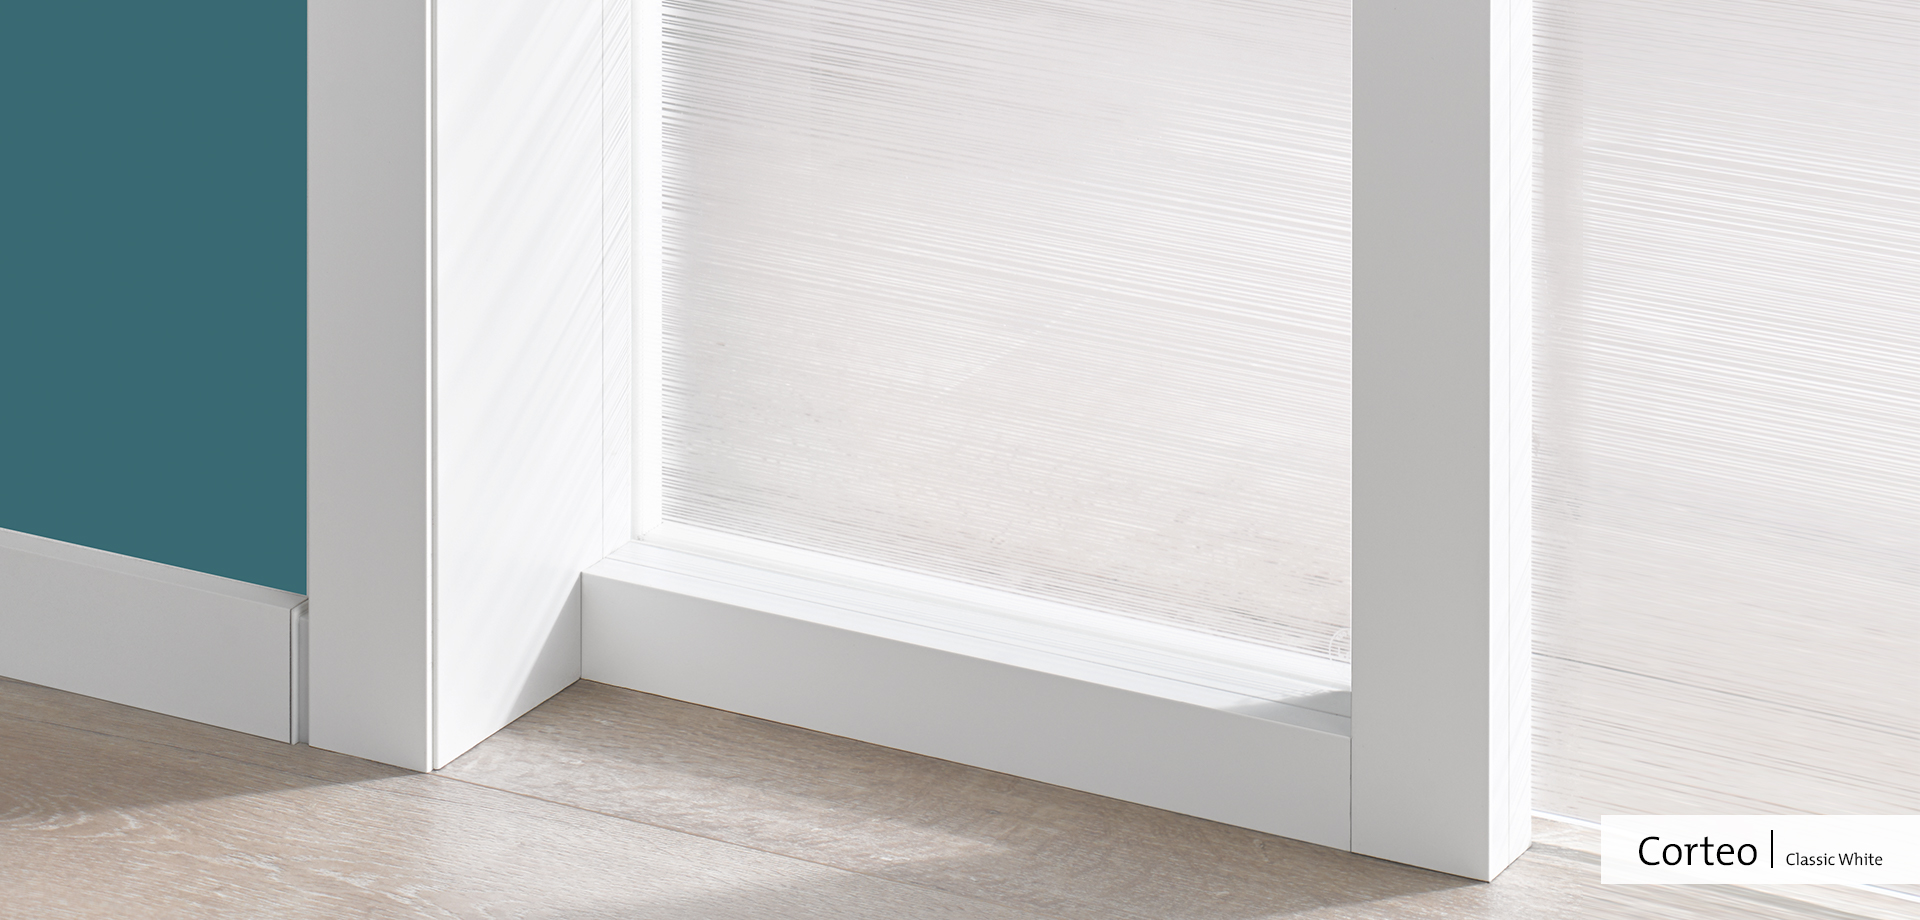 Corteo Detail   Classic White